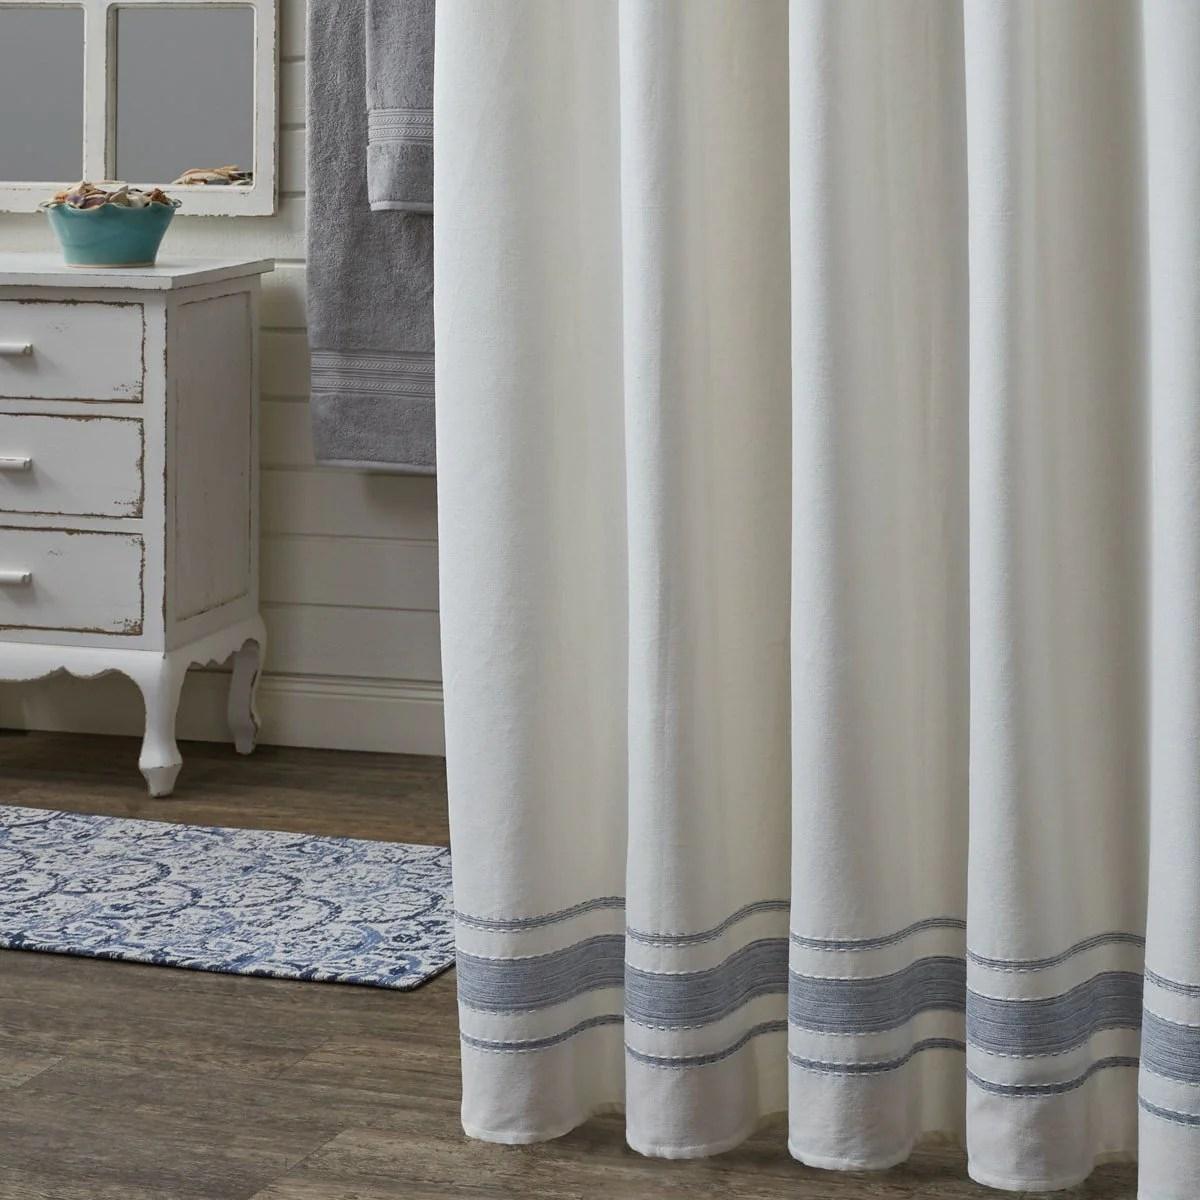 park designs summer breeze shower curtain 72 x 72 inches formal farmhouse bathroom free shipping